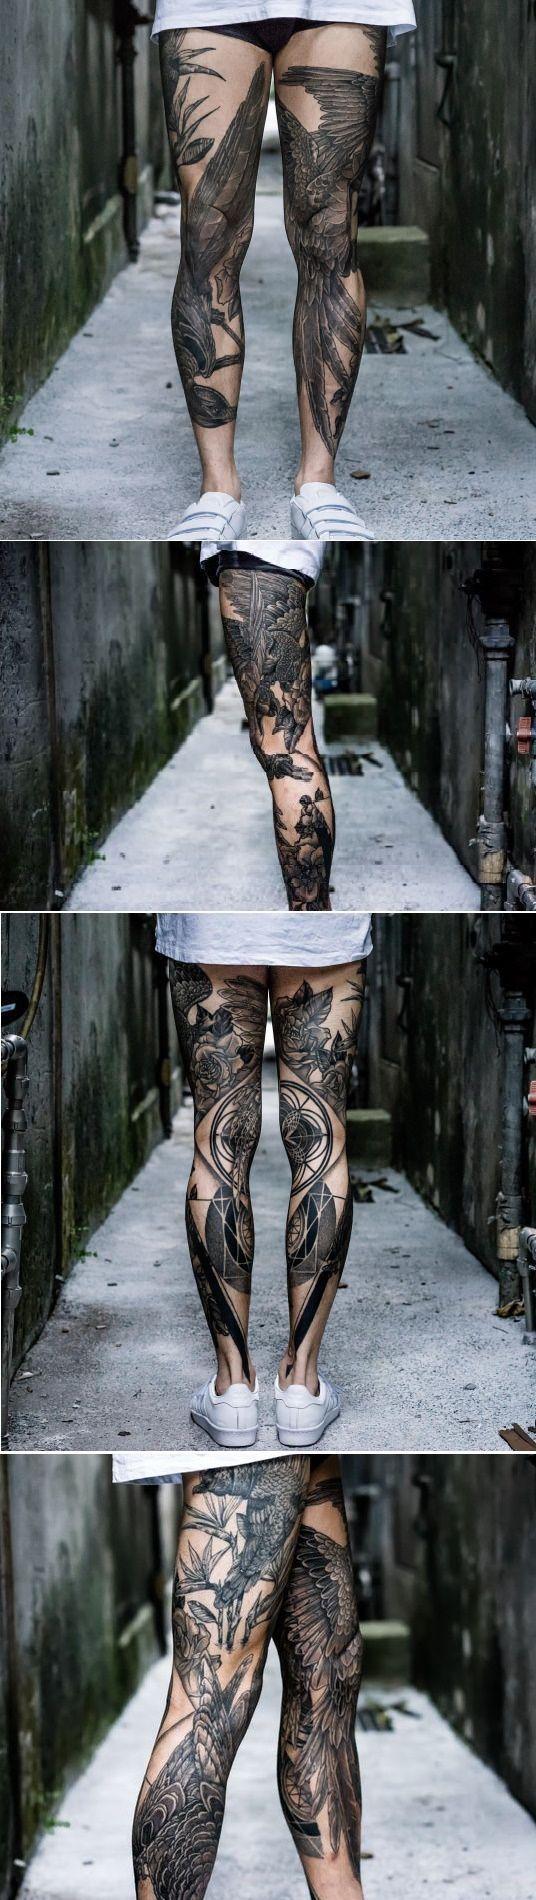 Amazing Leg Tattoo Ideas For Girls Trending 2017: (mit